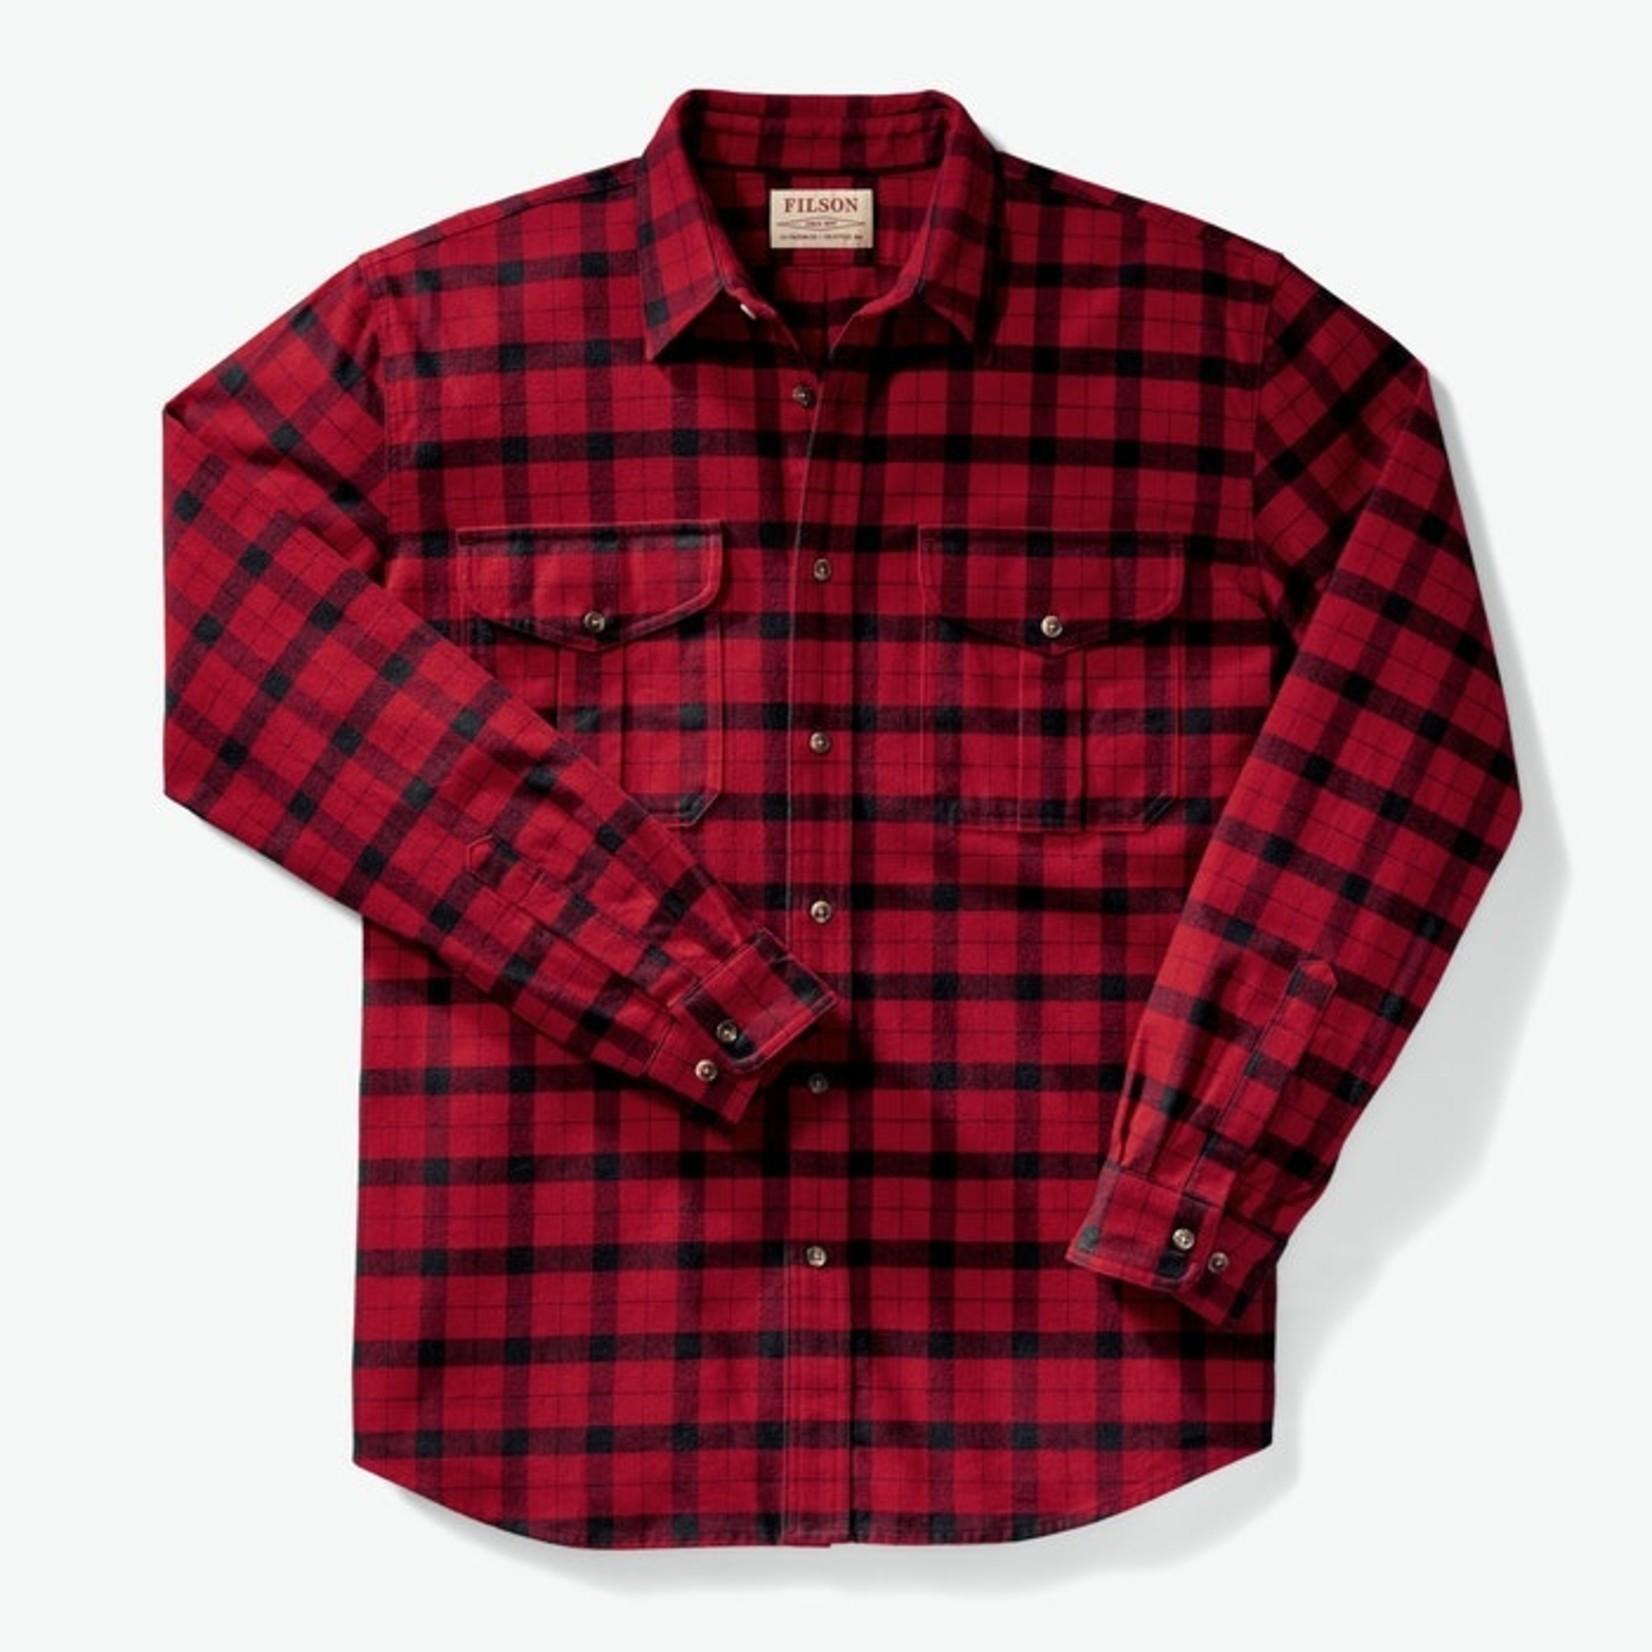 Filson Filson 11012006 Alaskan Guide Shirt - 2 Colors